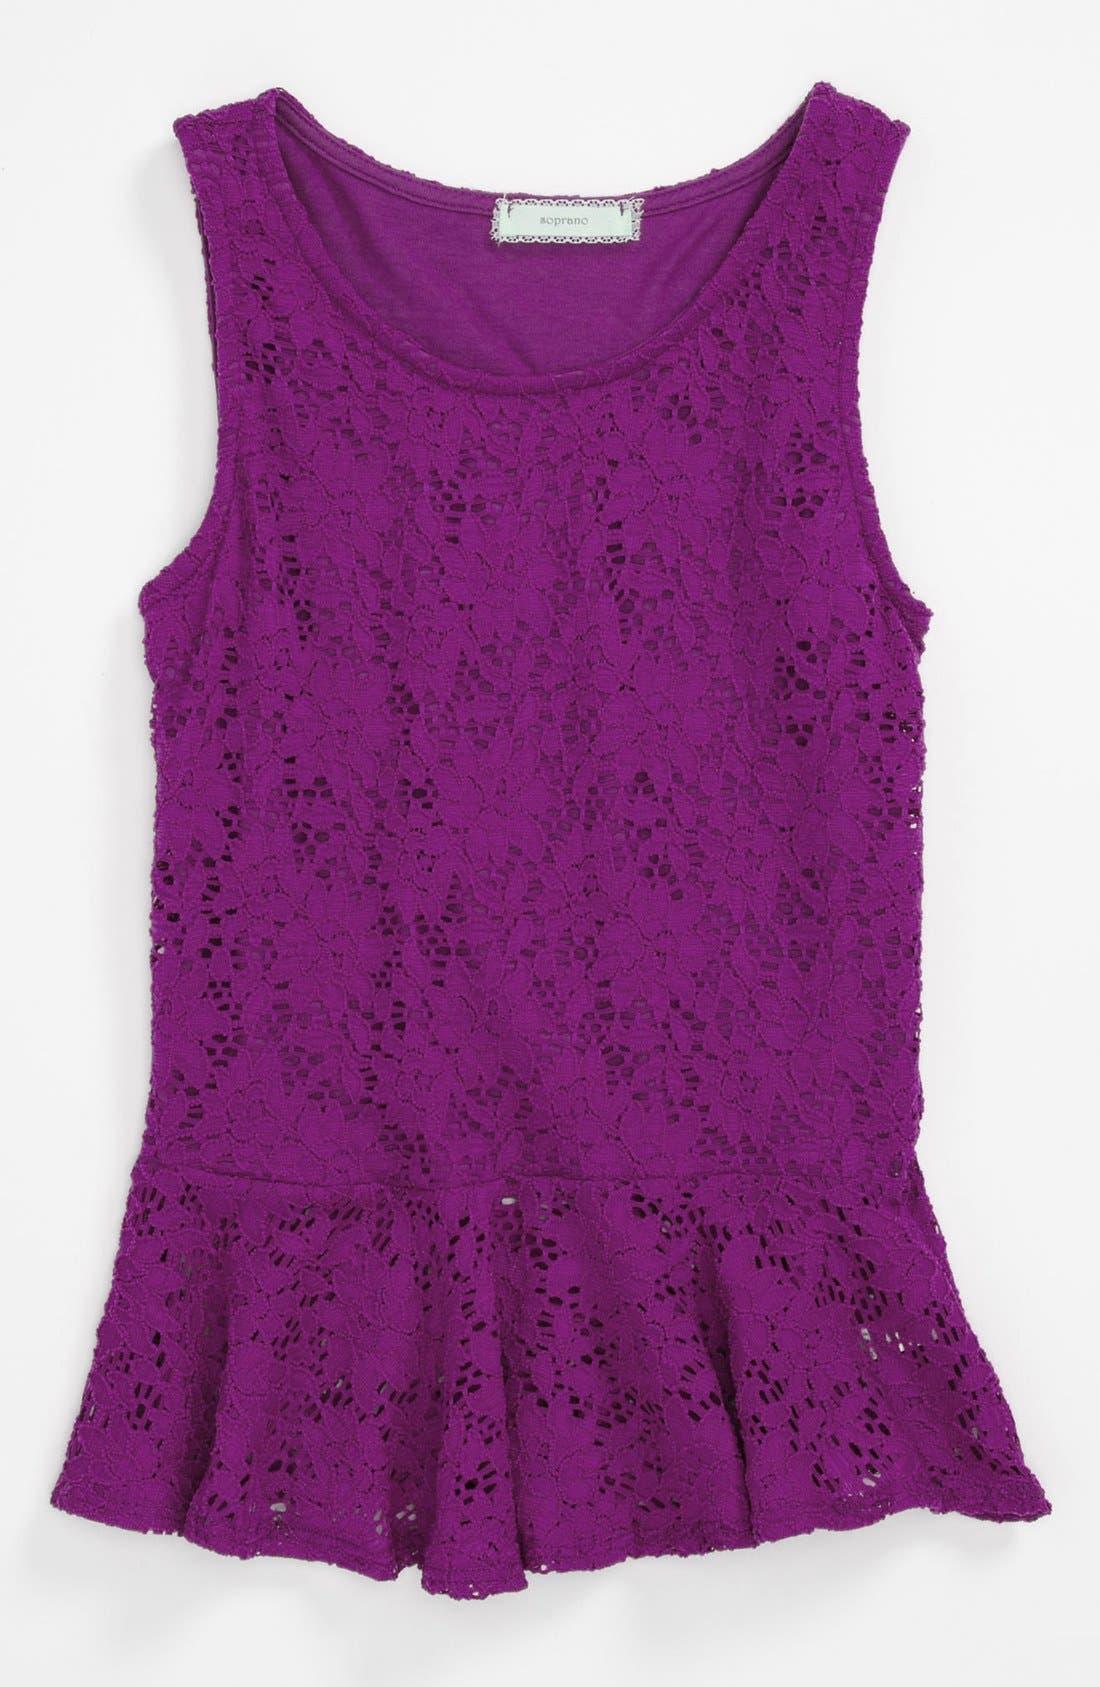 Alternate Image 1 Selected - Soprano Lace Peplum Shirt (Big Girls)